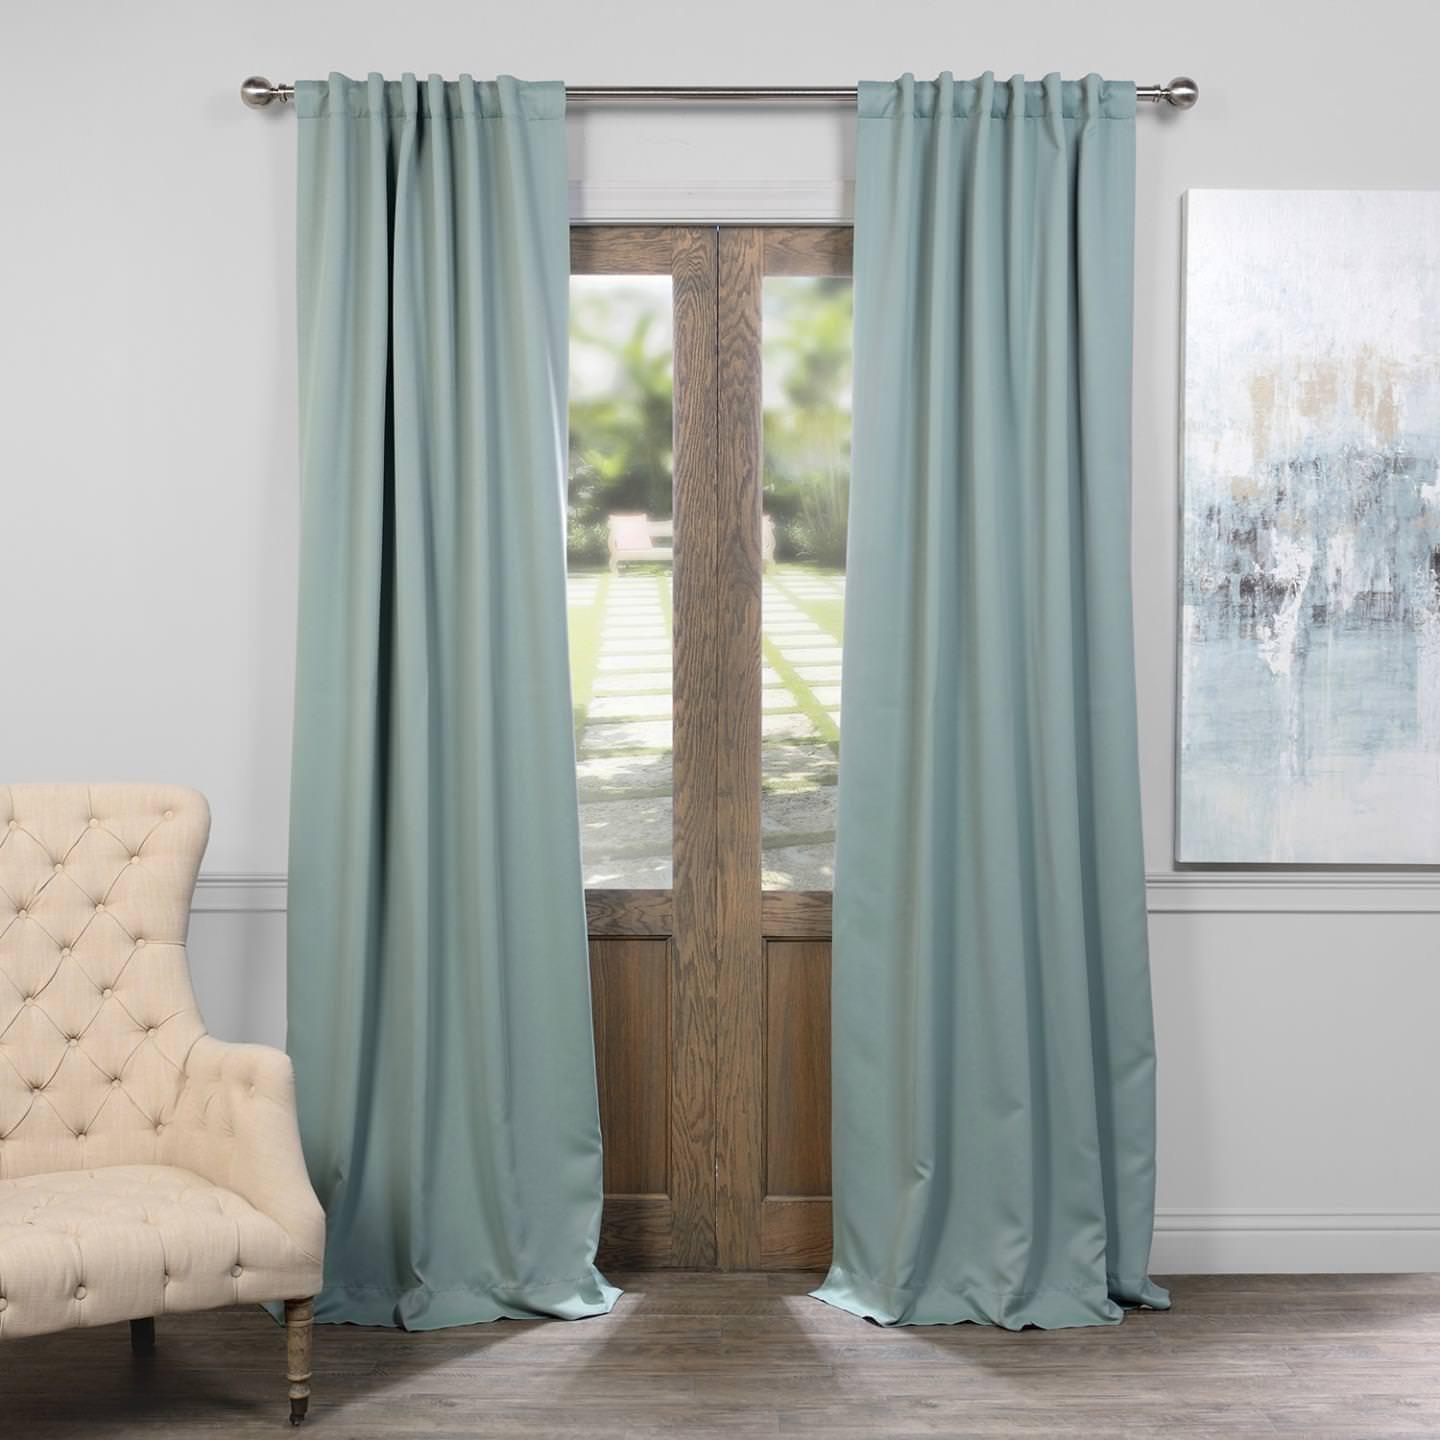 Juniper Berry 50 x 108 HPD HALF PRICE DRAPES BOCH-194906-108 Room Darkening Curtain 50 x 108 Dark Mallard 1 Panel